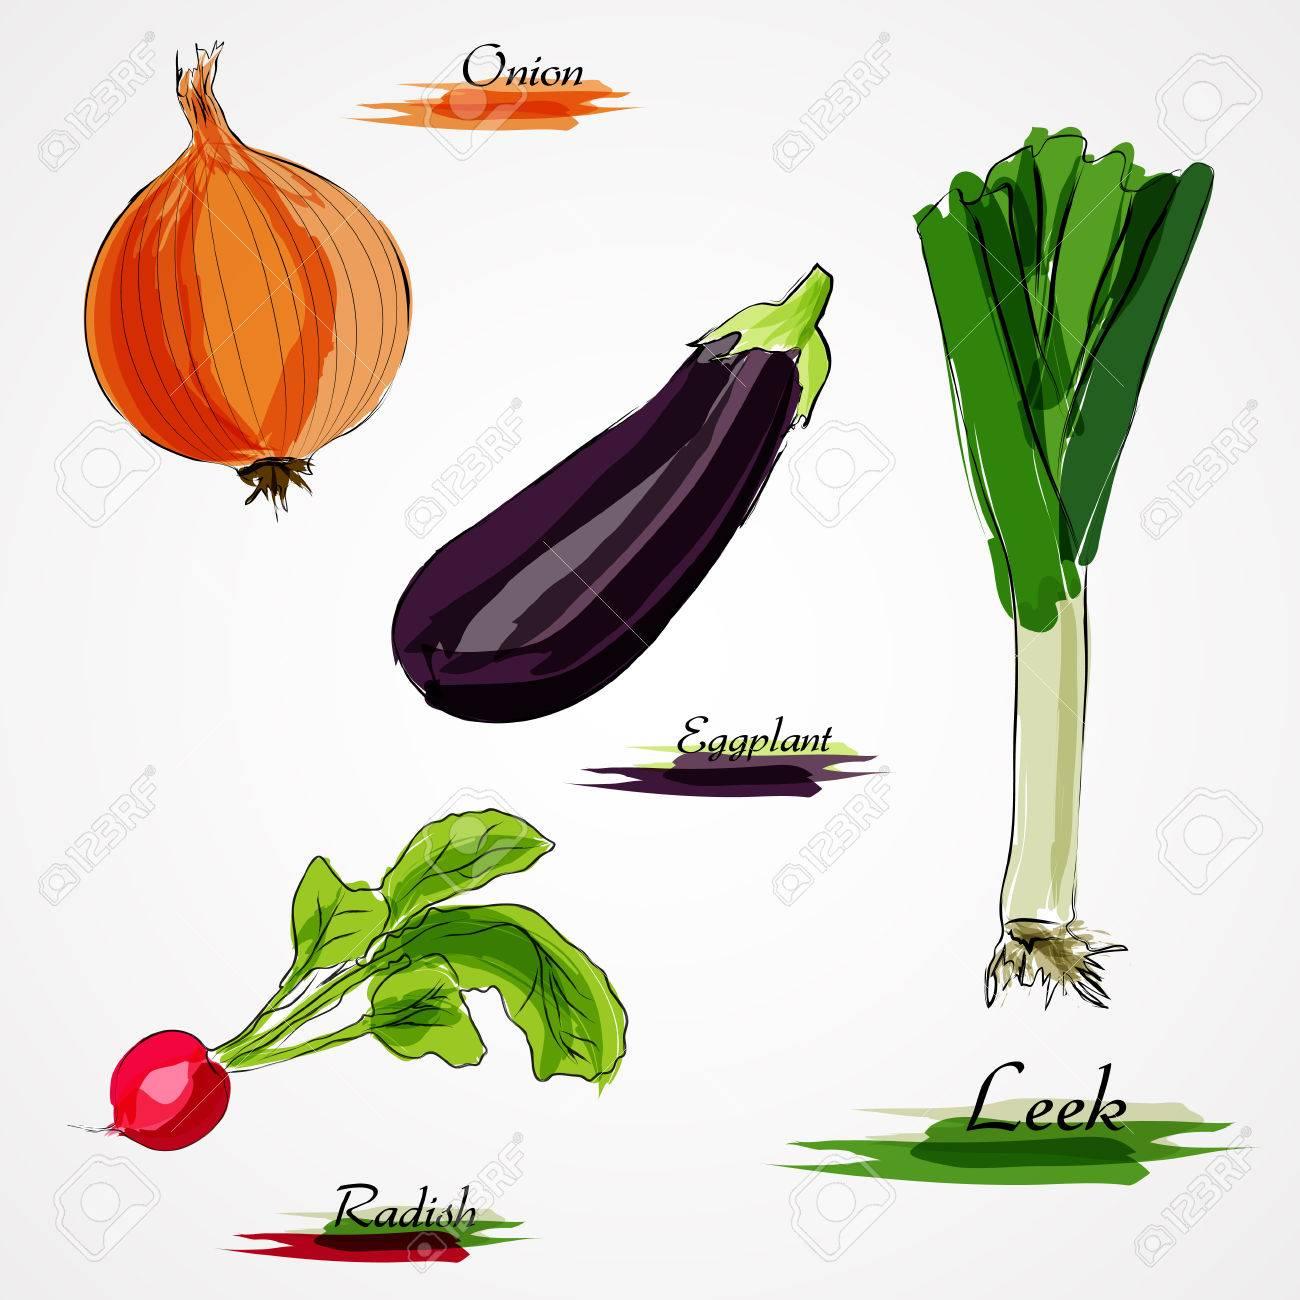 Set of hand drawn vector ripe whole vegetables, llek, white onion, eggplant and radish on light background - 46570740